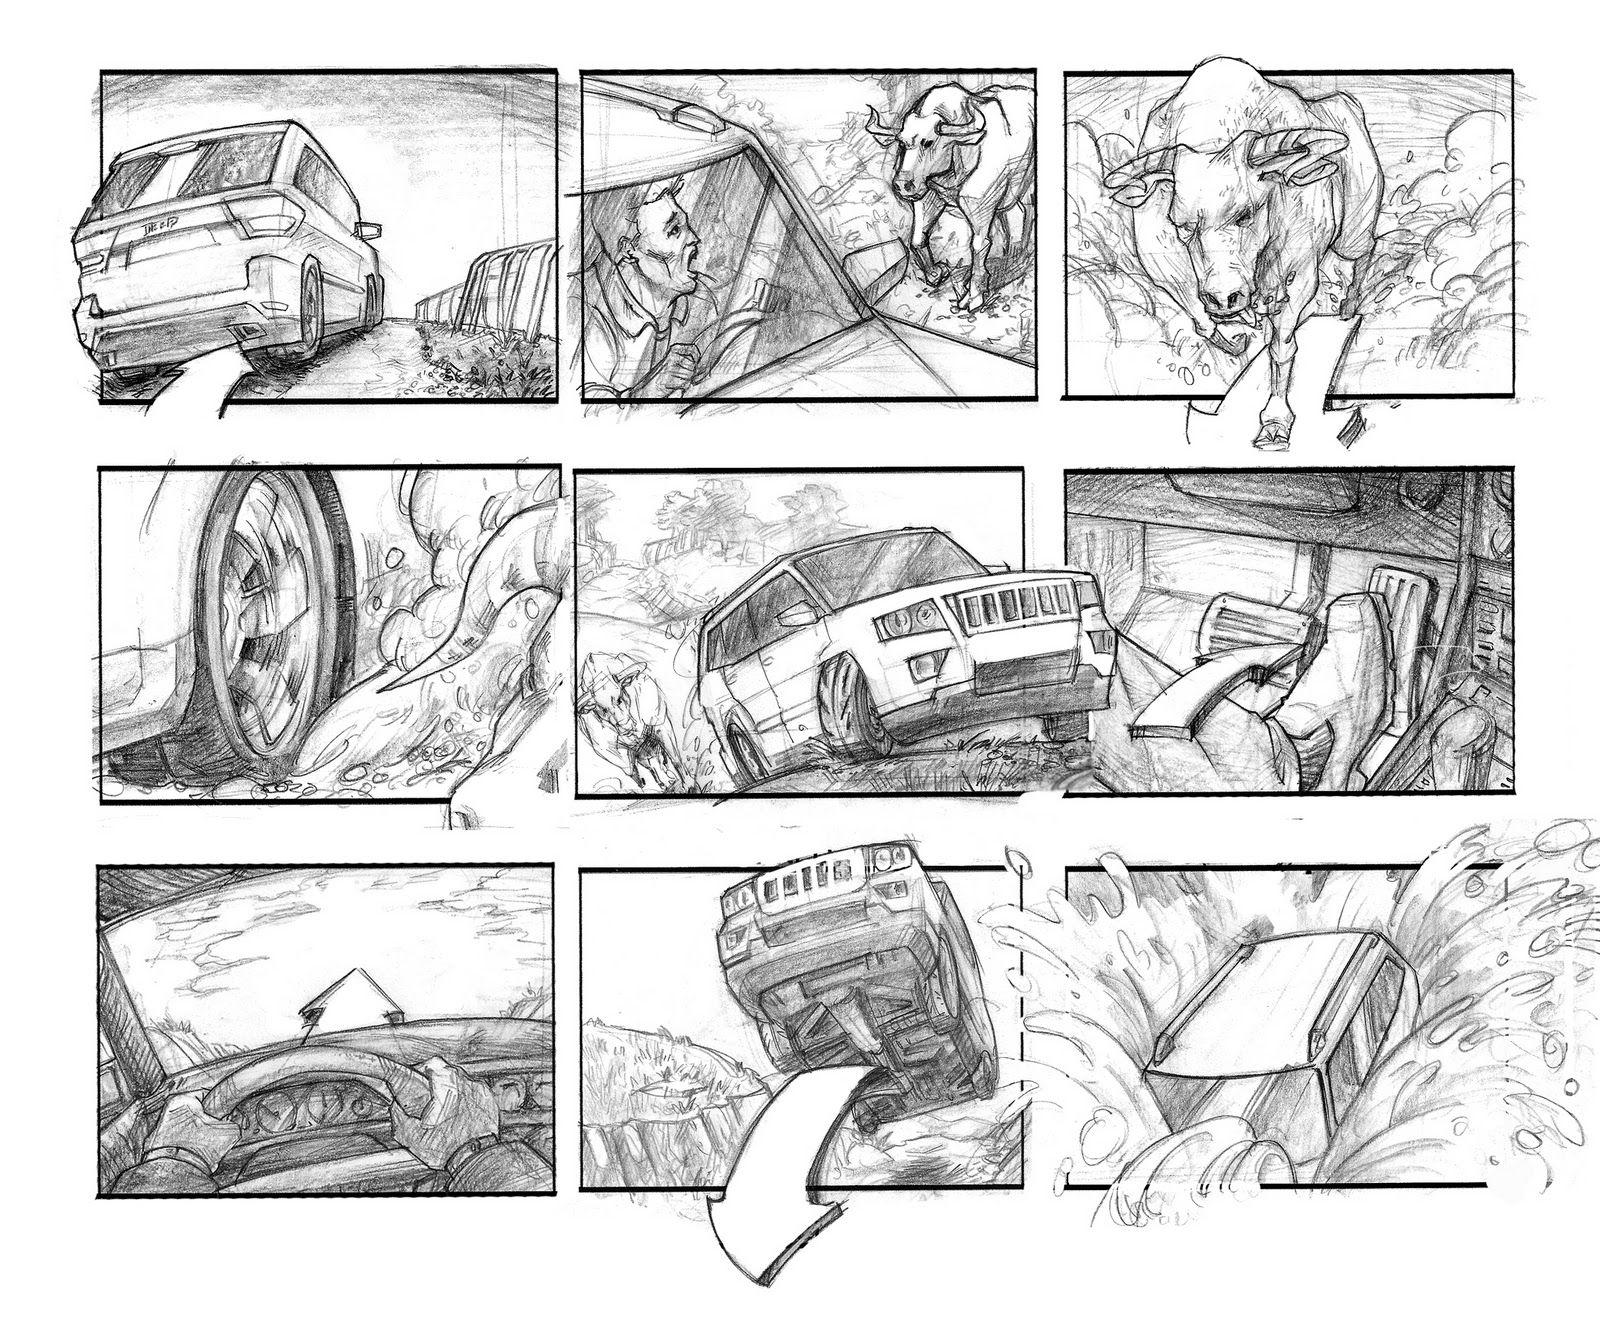 Pin by John Napolitano on CGR105 - Storyboard | Pinterest